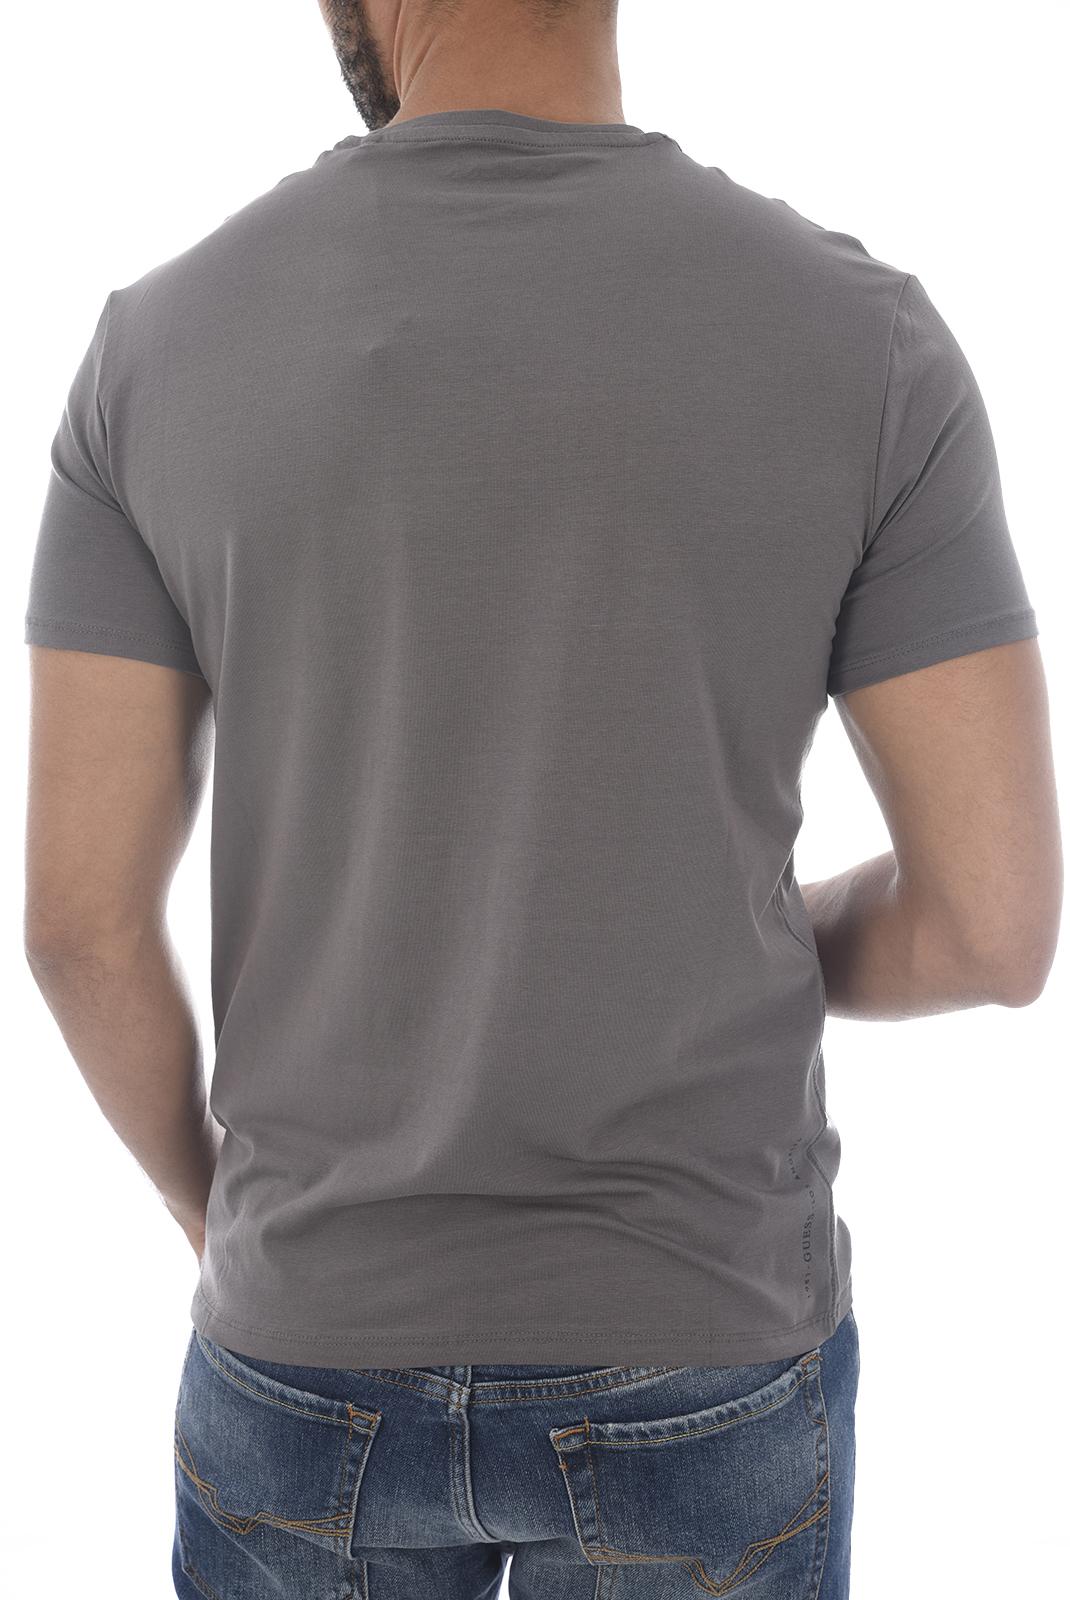 T-S manches courtes  Guess jeans M83I17 J1300 TXDG